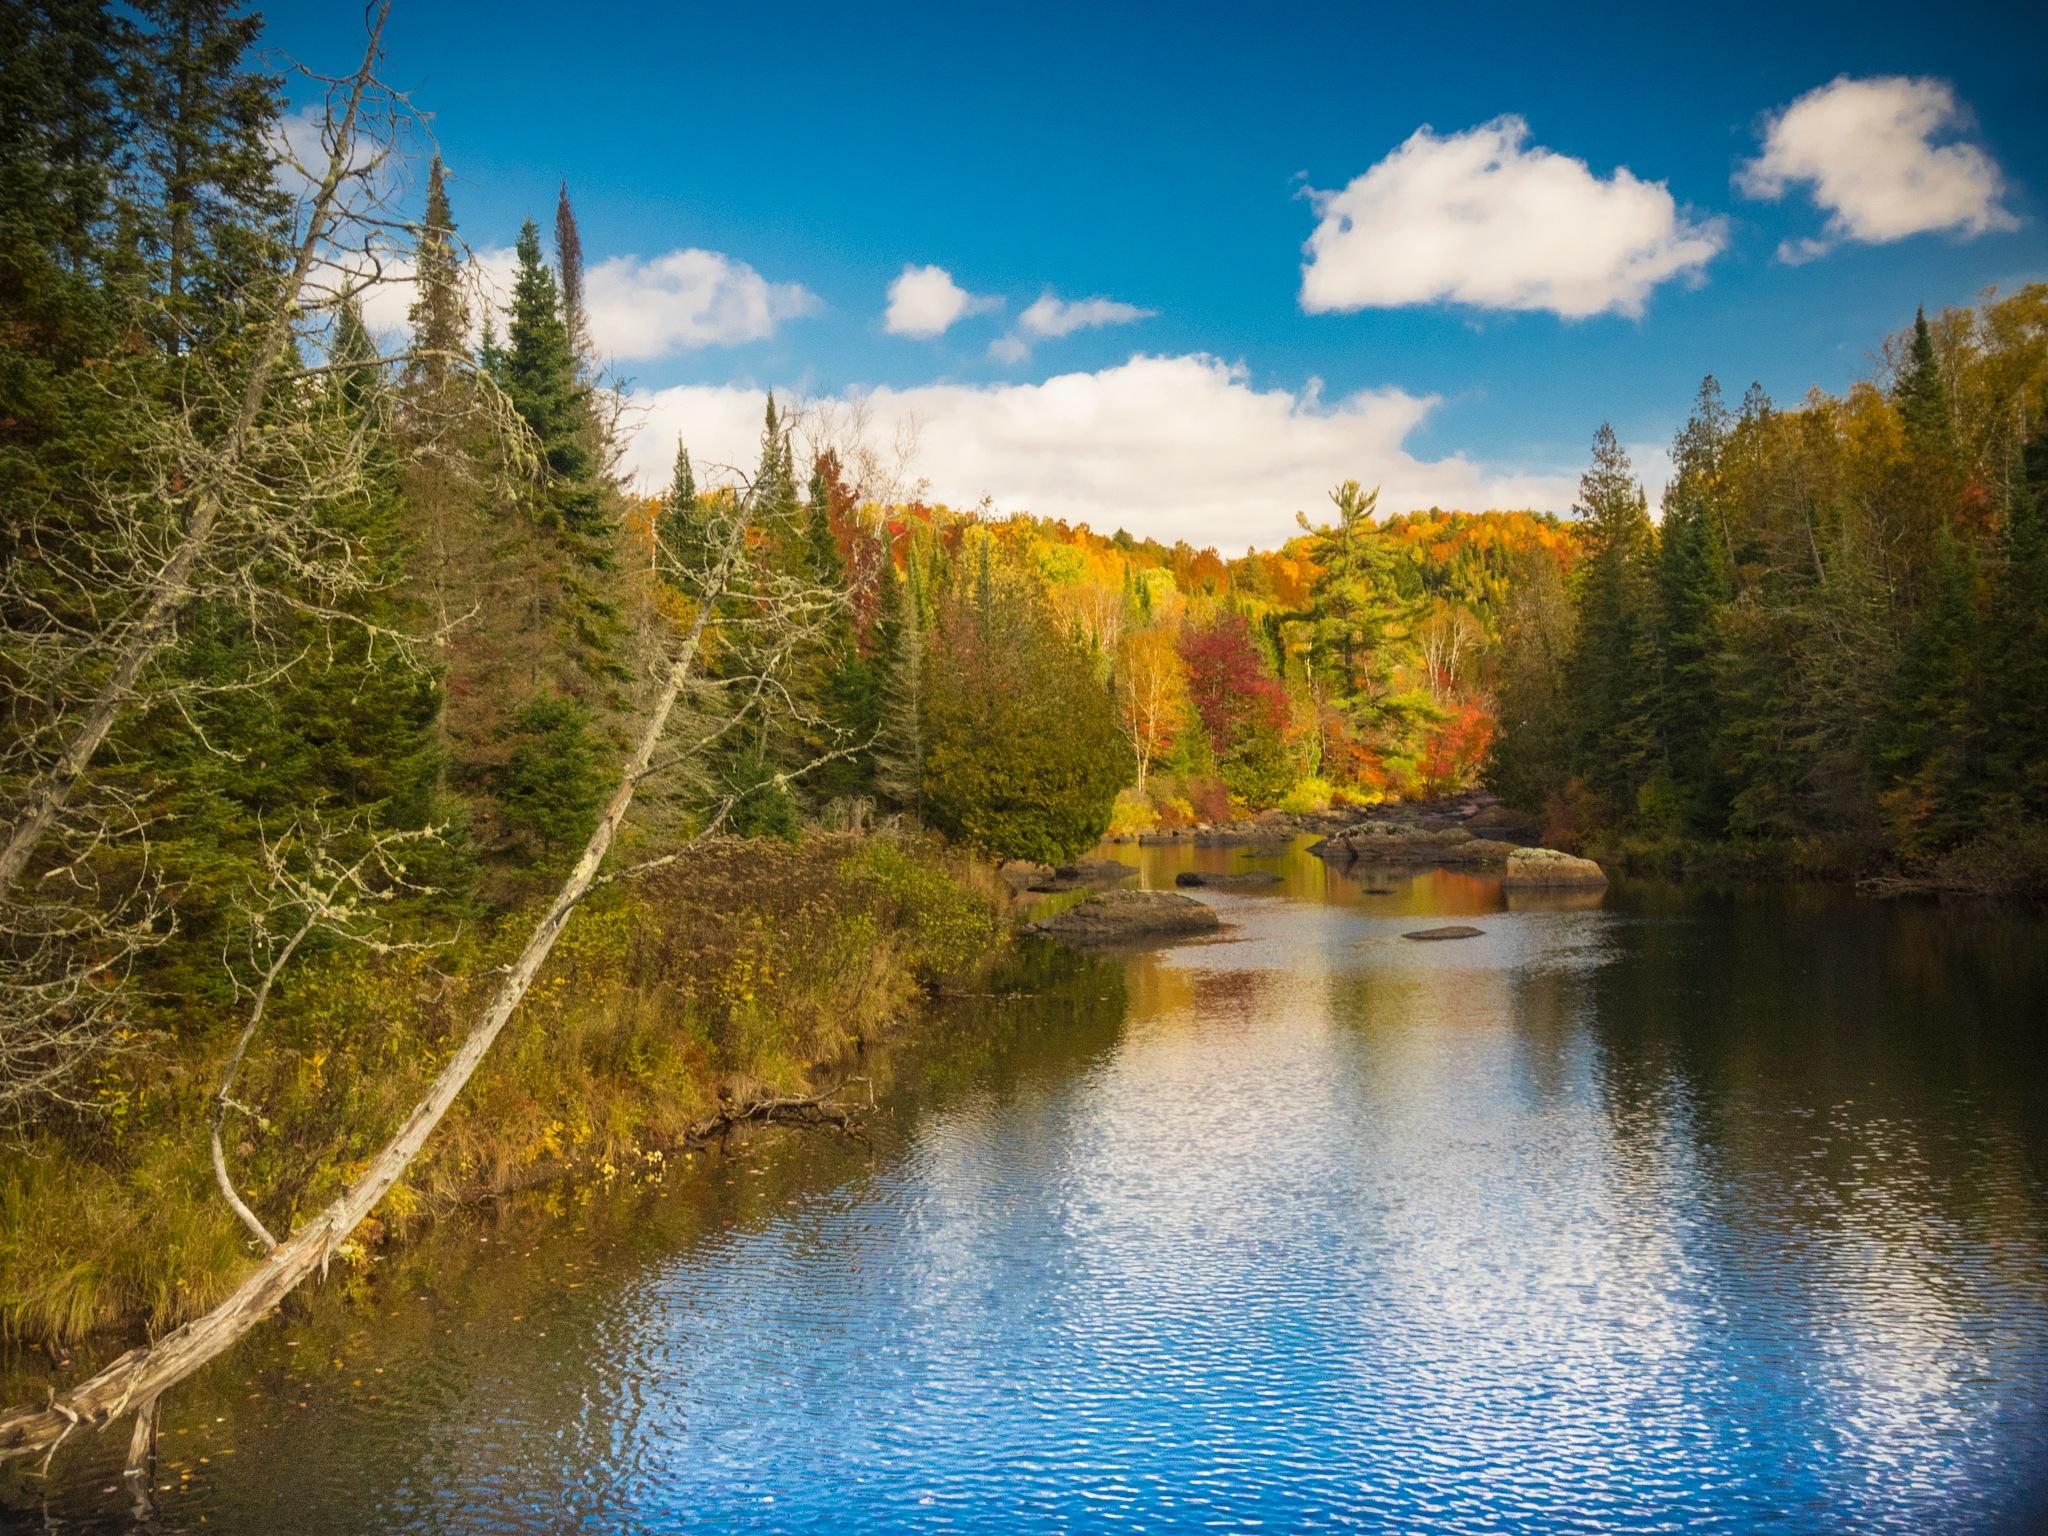 Autumn Landscape by Eugenie Robitaille